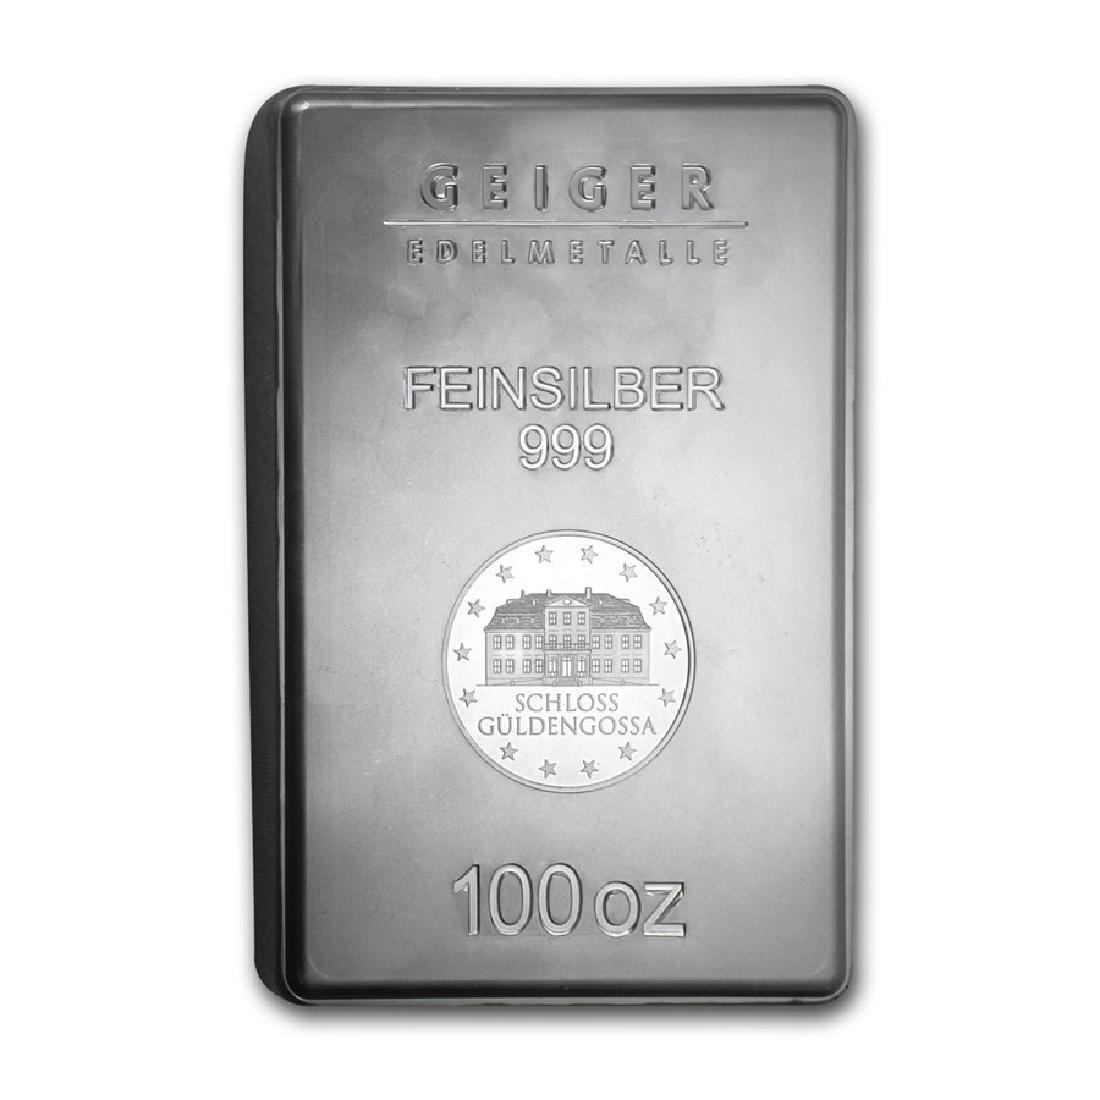 One piece 100 oz 0.999 Fine Silver Bar Geiger Security